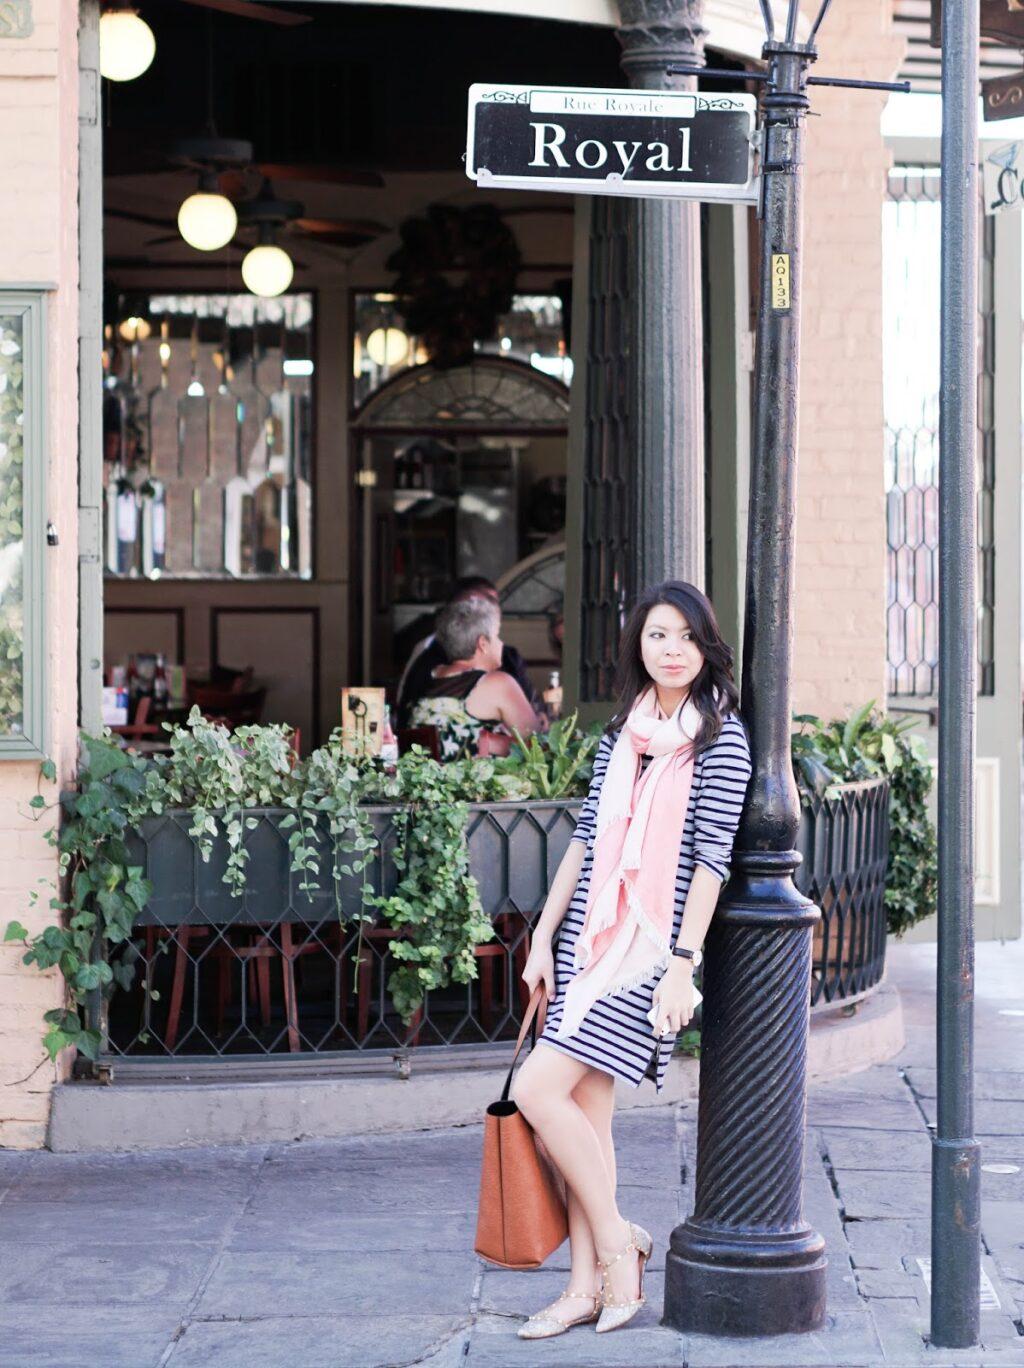 justatinabit-jcrew-striped-tee-dress-zipped-side-halogen-scarf-olson-pointy-flats